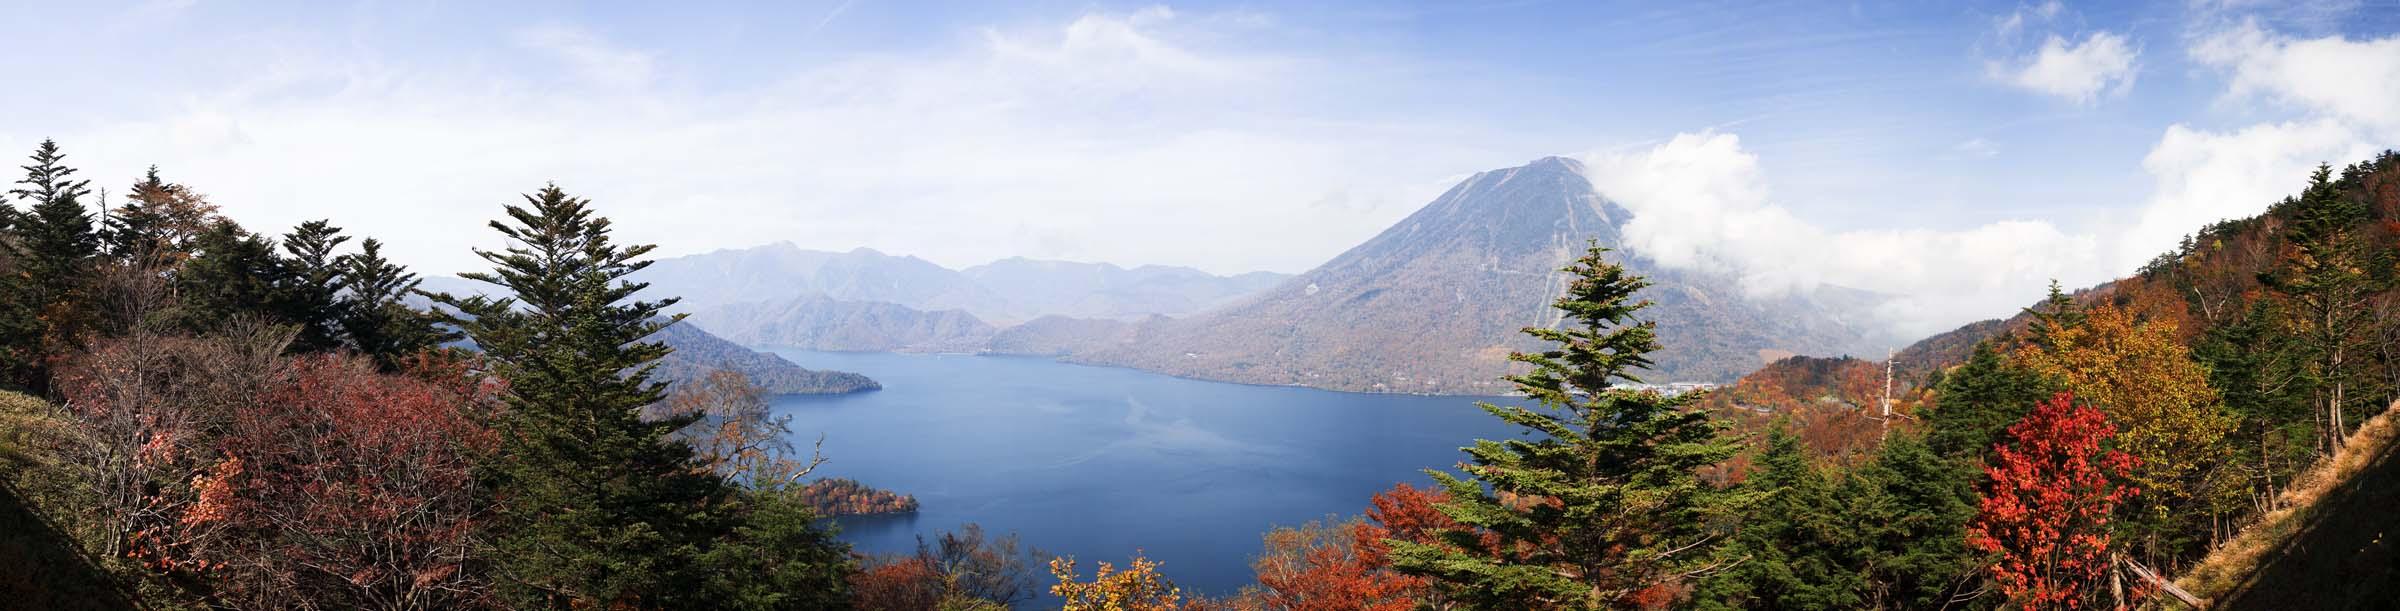 fotografia, materiale, libero il panorama, dipinga, fotografia di scorta,Lago Chuzenji-ko di foglie colorate, Lago Chuzenji-ko, Foglie colorate, Mt. figura maschia, cielo blu